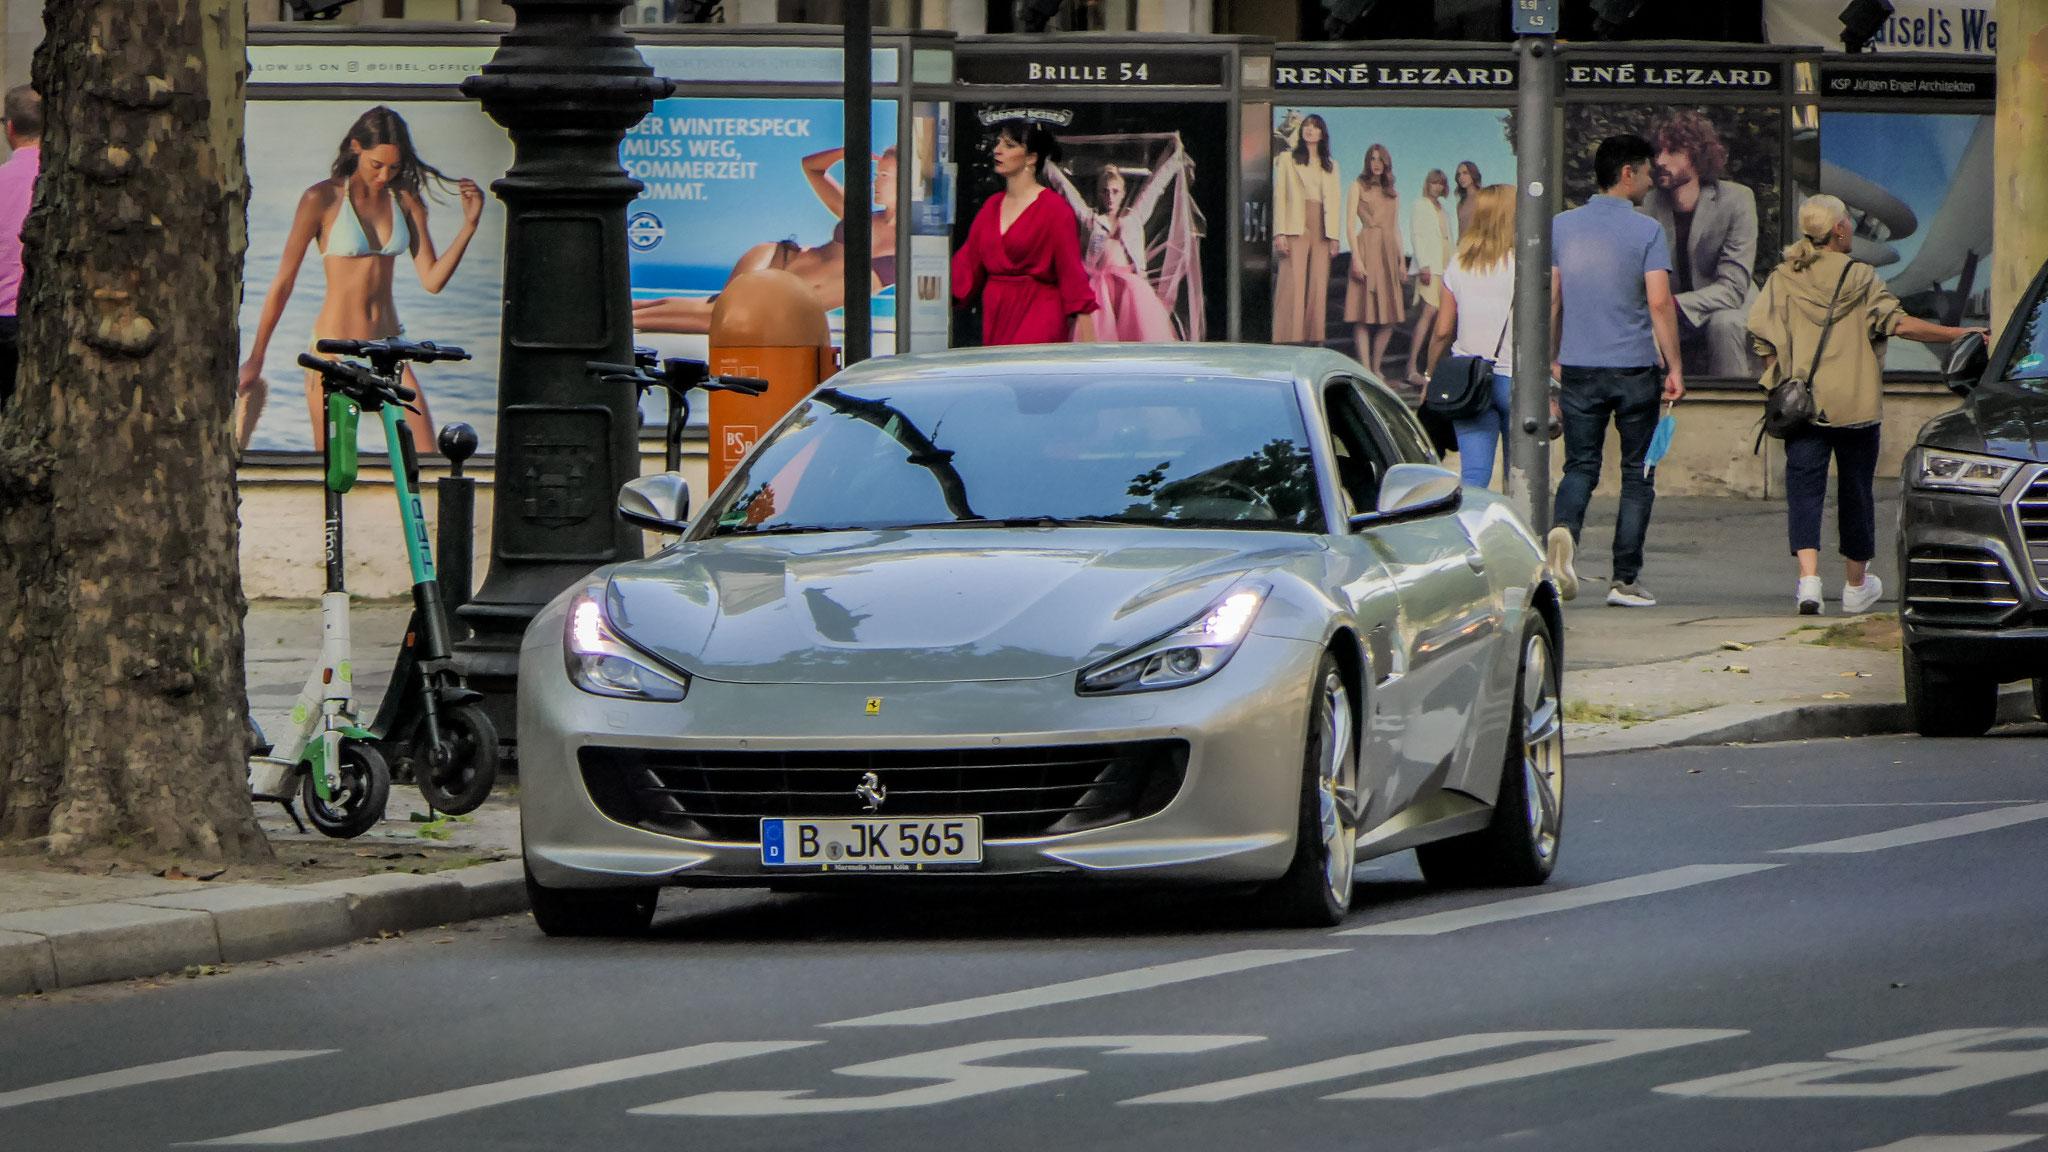 Ferrari GTC4 Lusso - B-JK-565